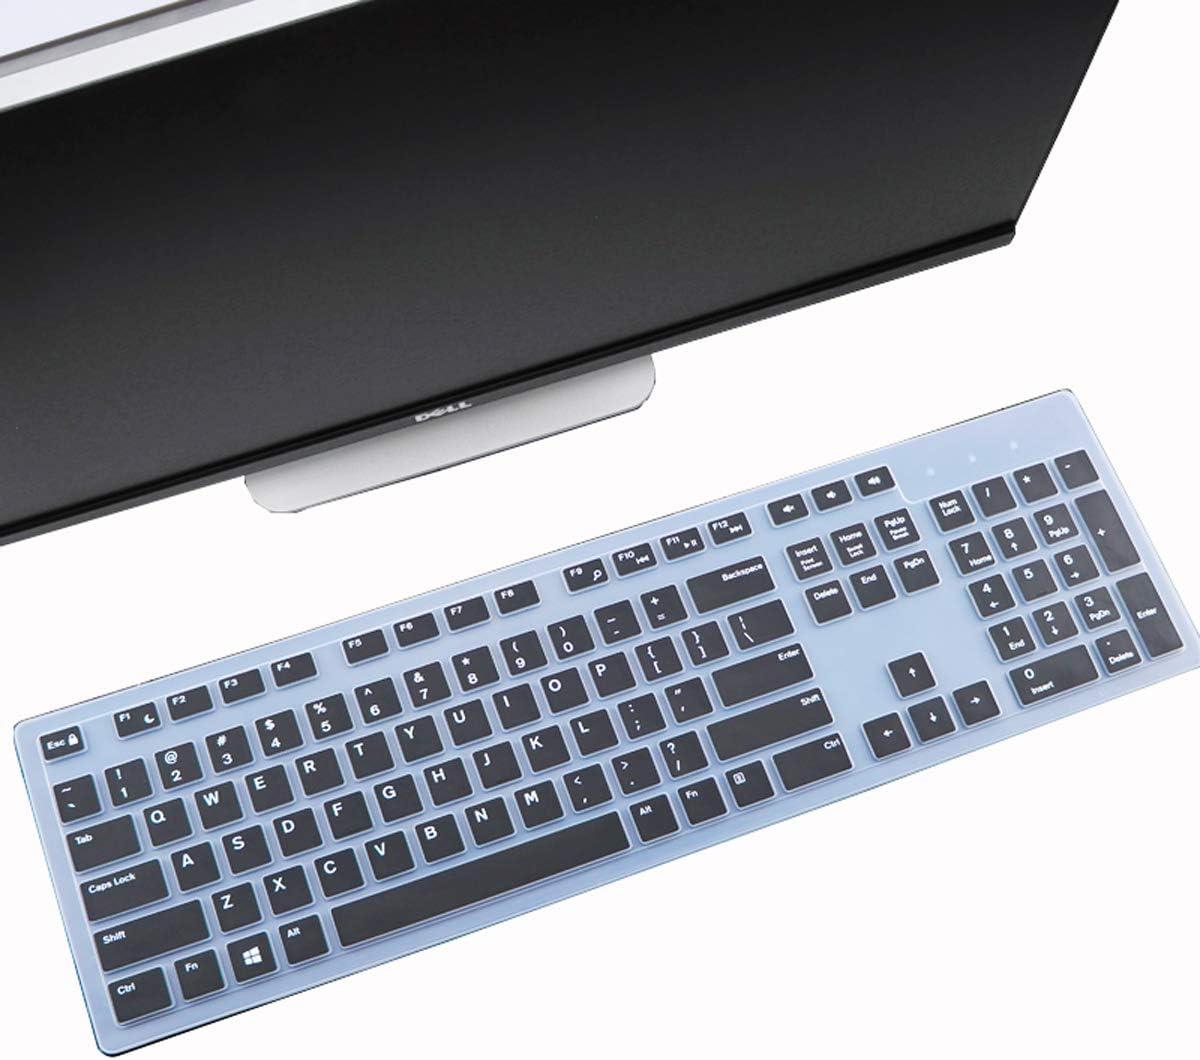 Keyboard Cover Skin Fit Dell KM636 Wireless Keyboard/Dell KB216 Wired Keyboard/Dell Optiplex 5250 3050 3240 5460 7450 7050/Dell Inspiron AIO 3475/3670/3477 All-in one Desktop-Black